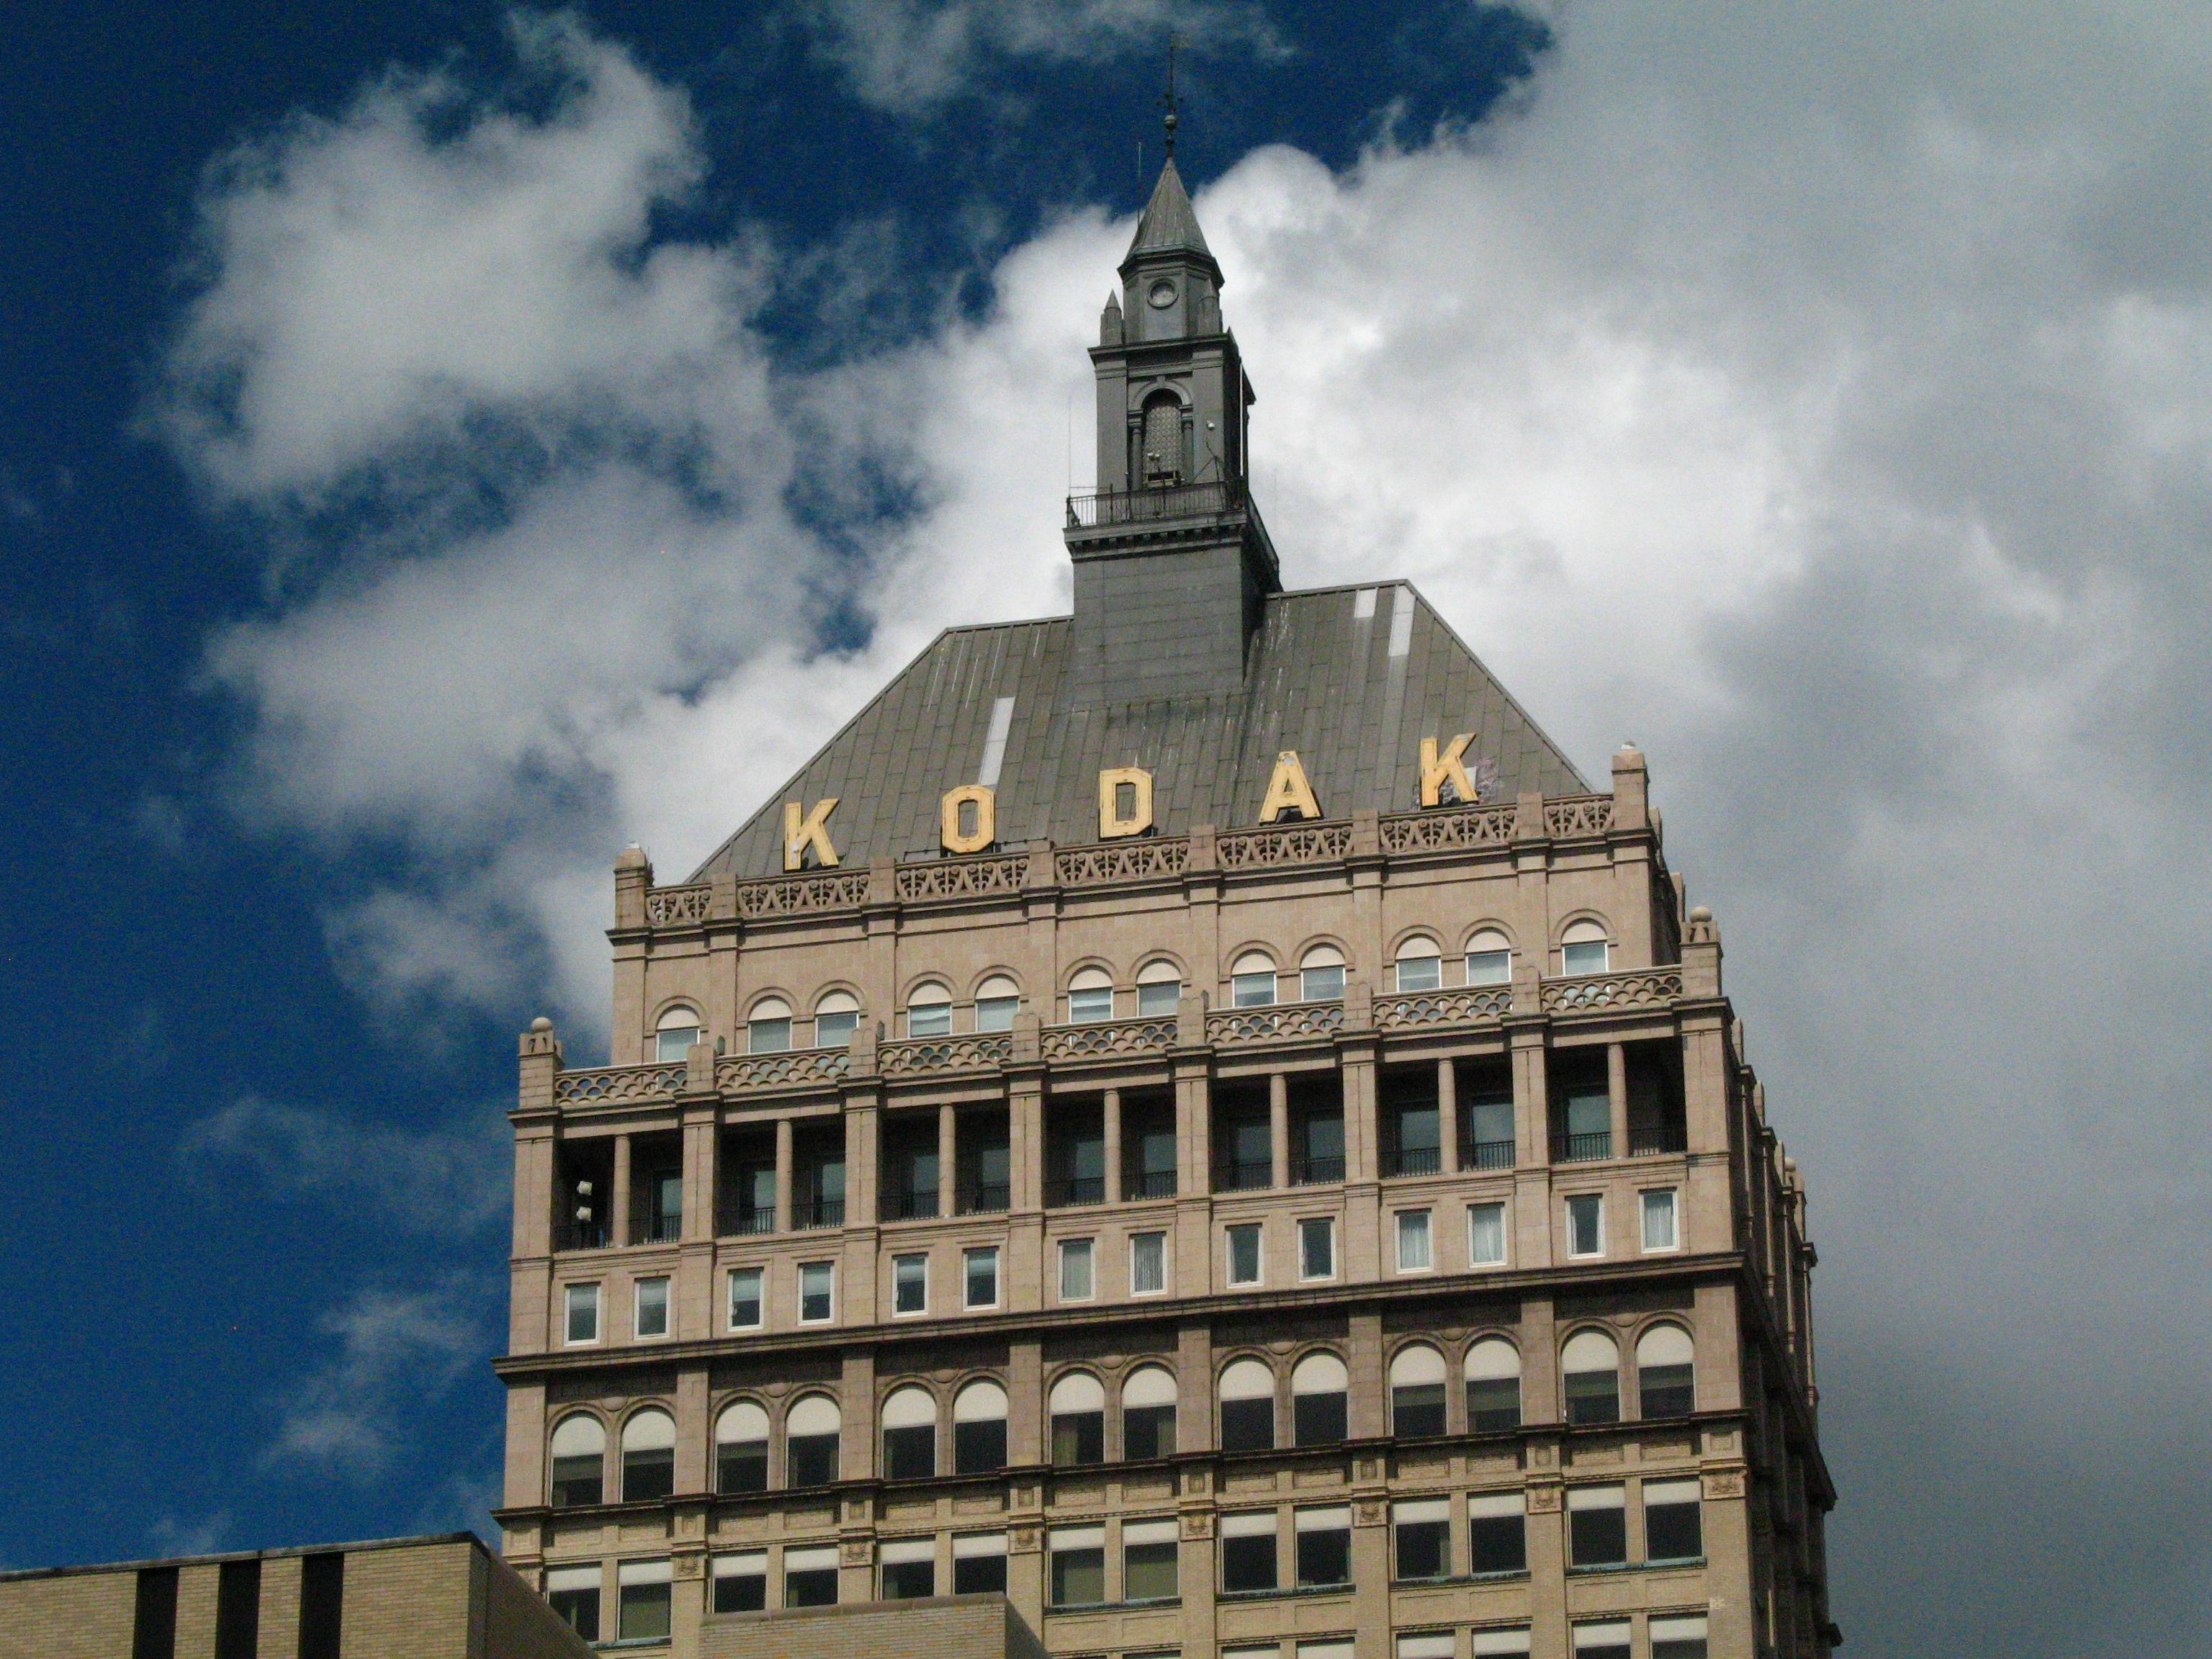 Kodak_Tower_storia.pg